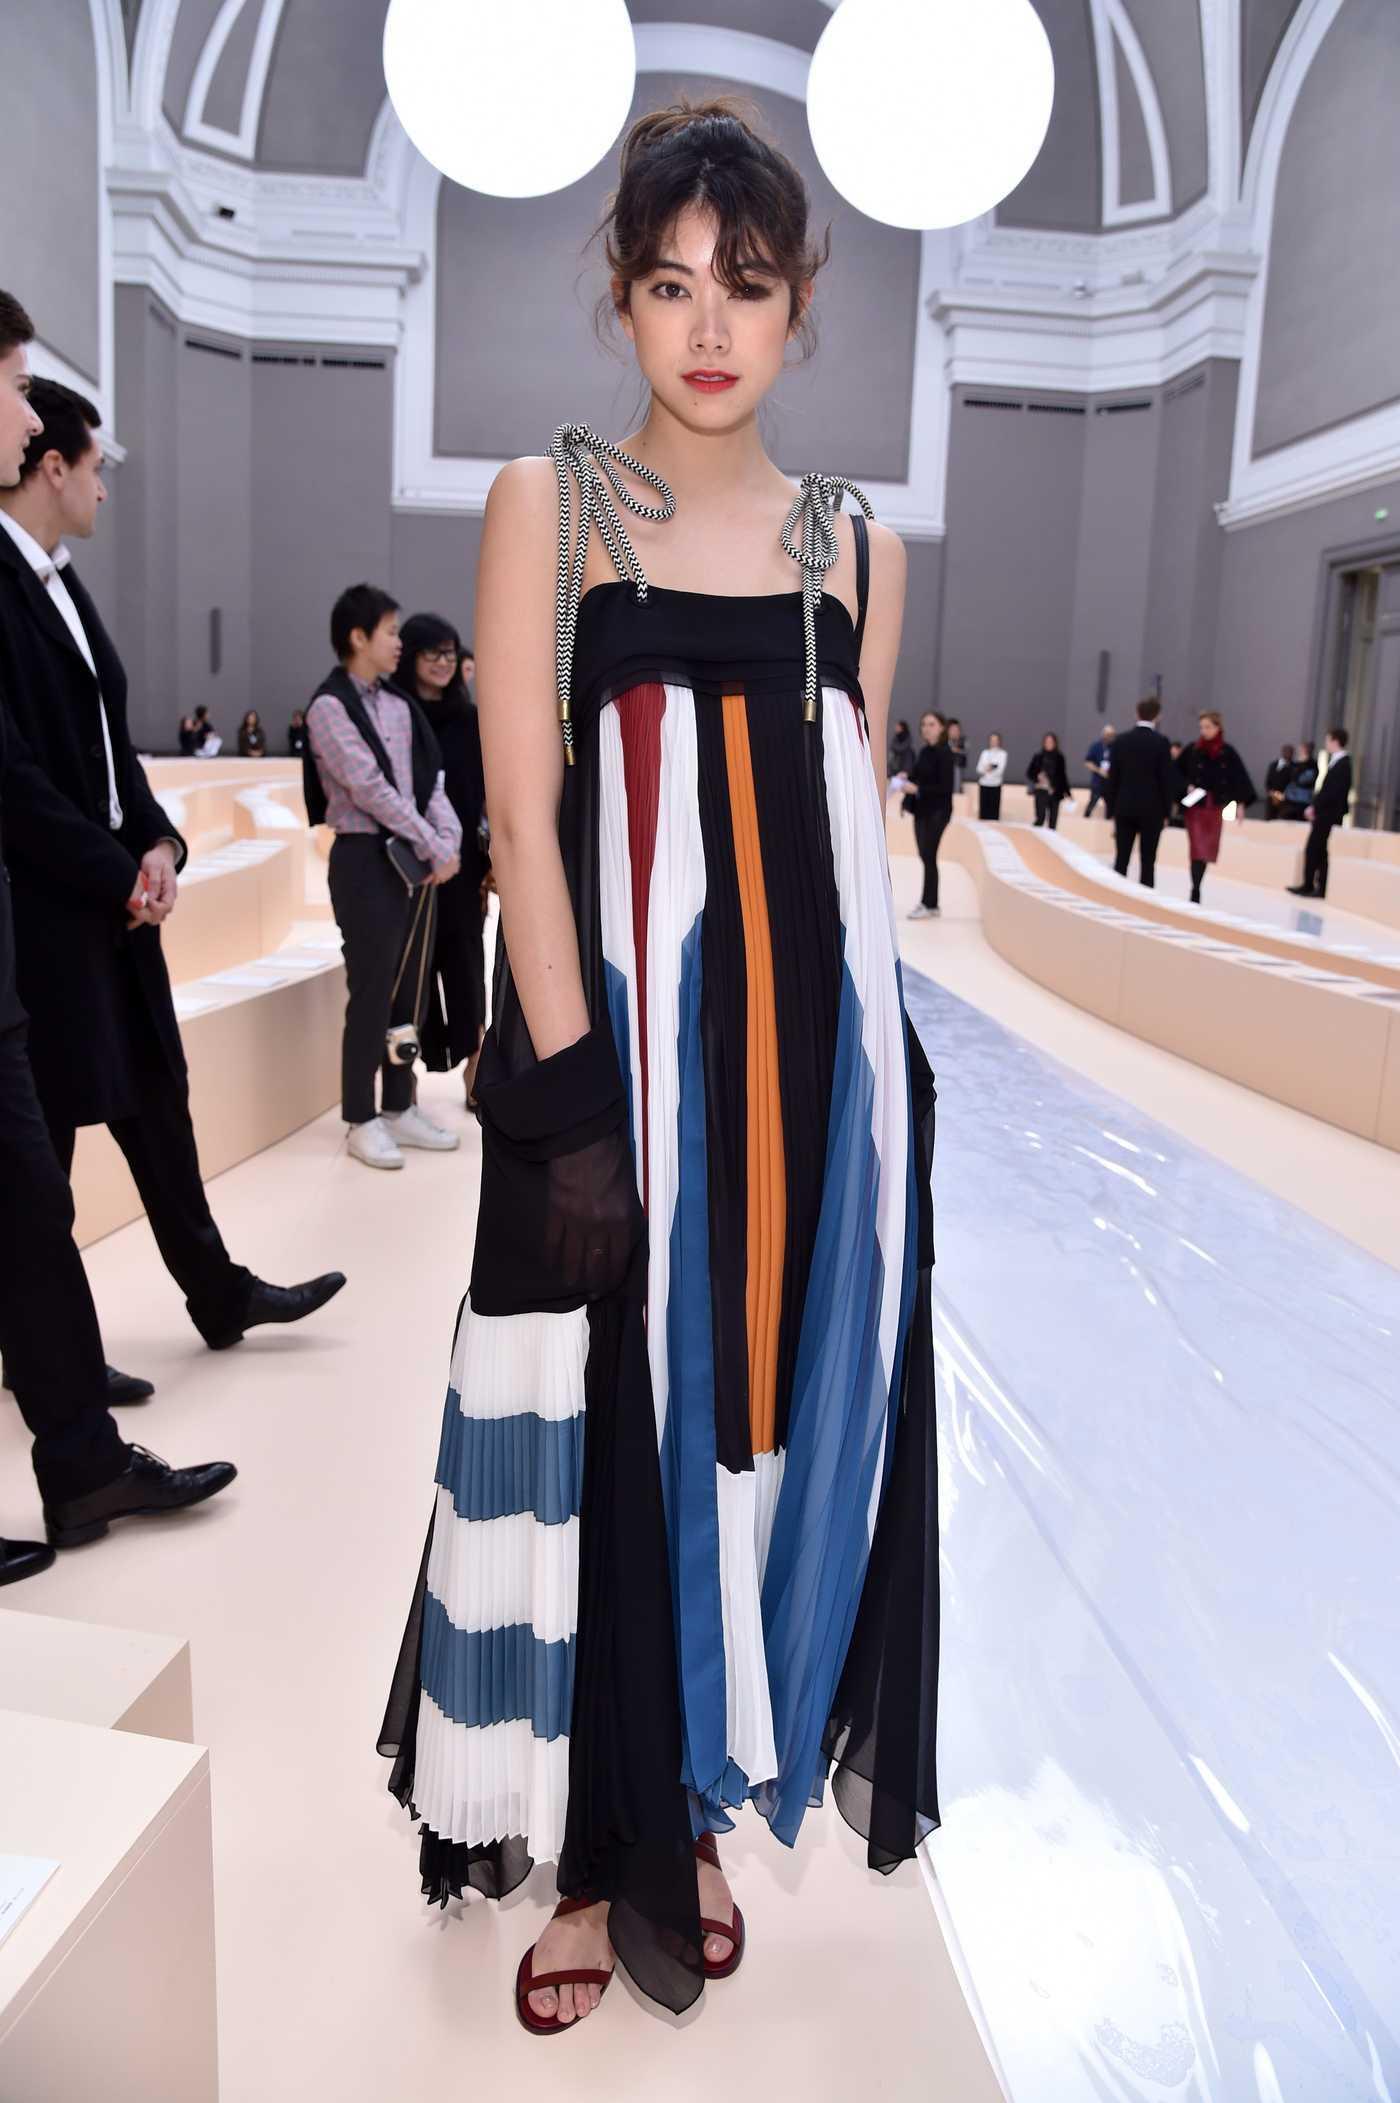 Hikari Mori at the Chloe Show During the Paris Fashion Week 03/02/2017